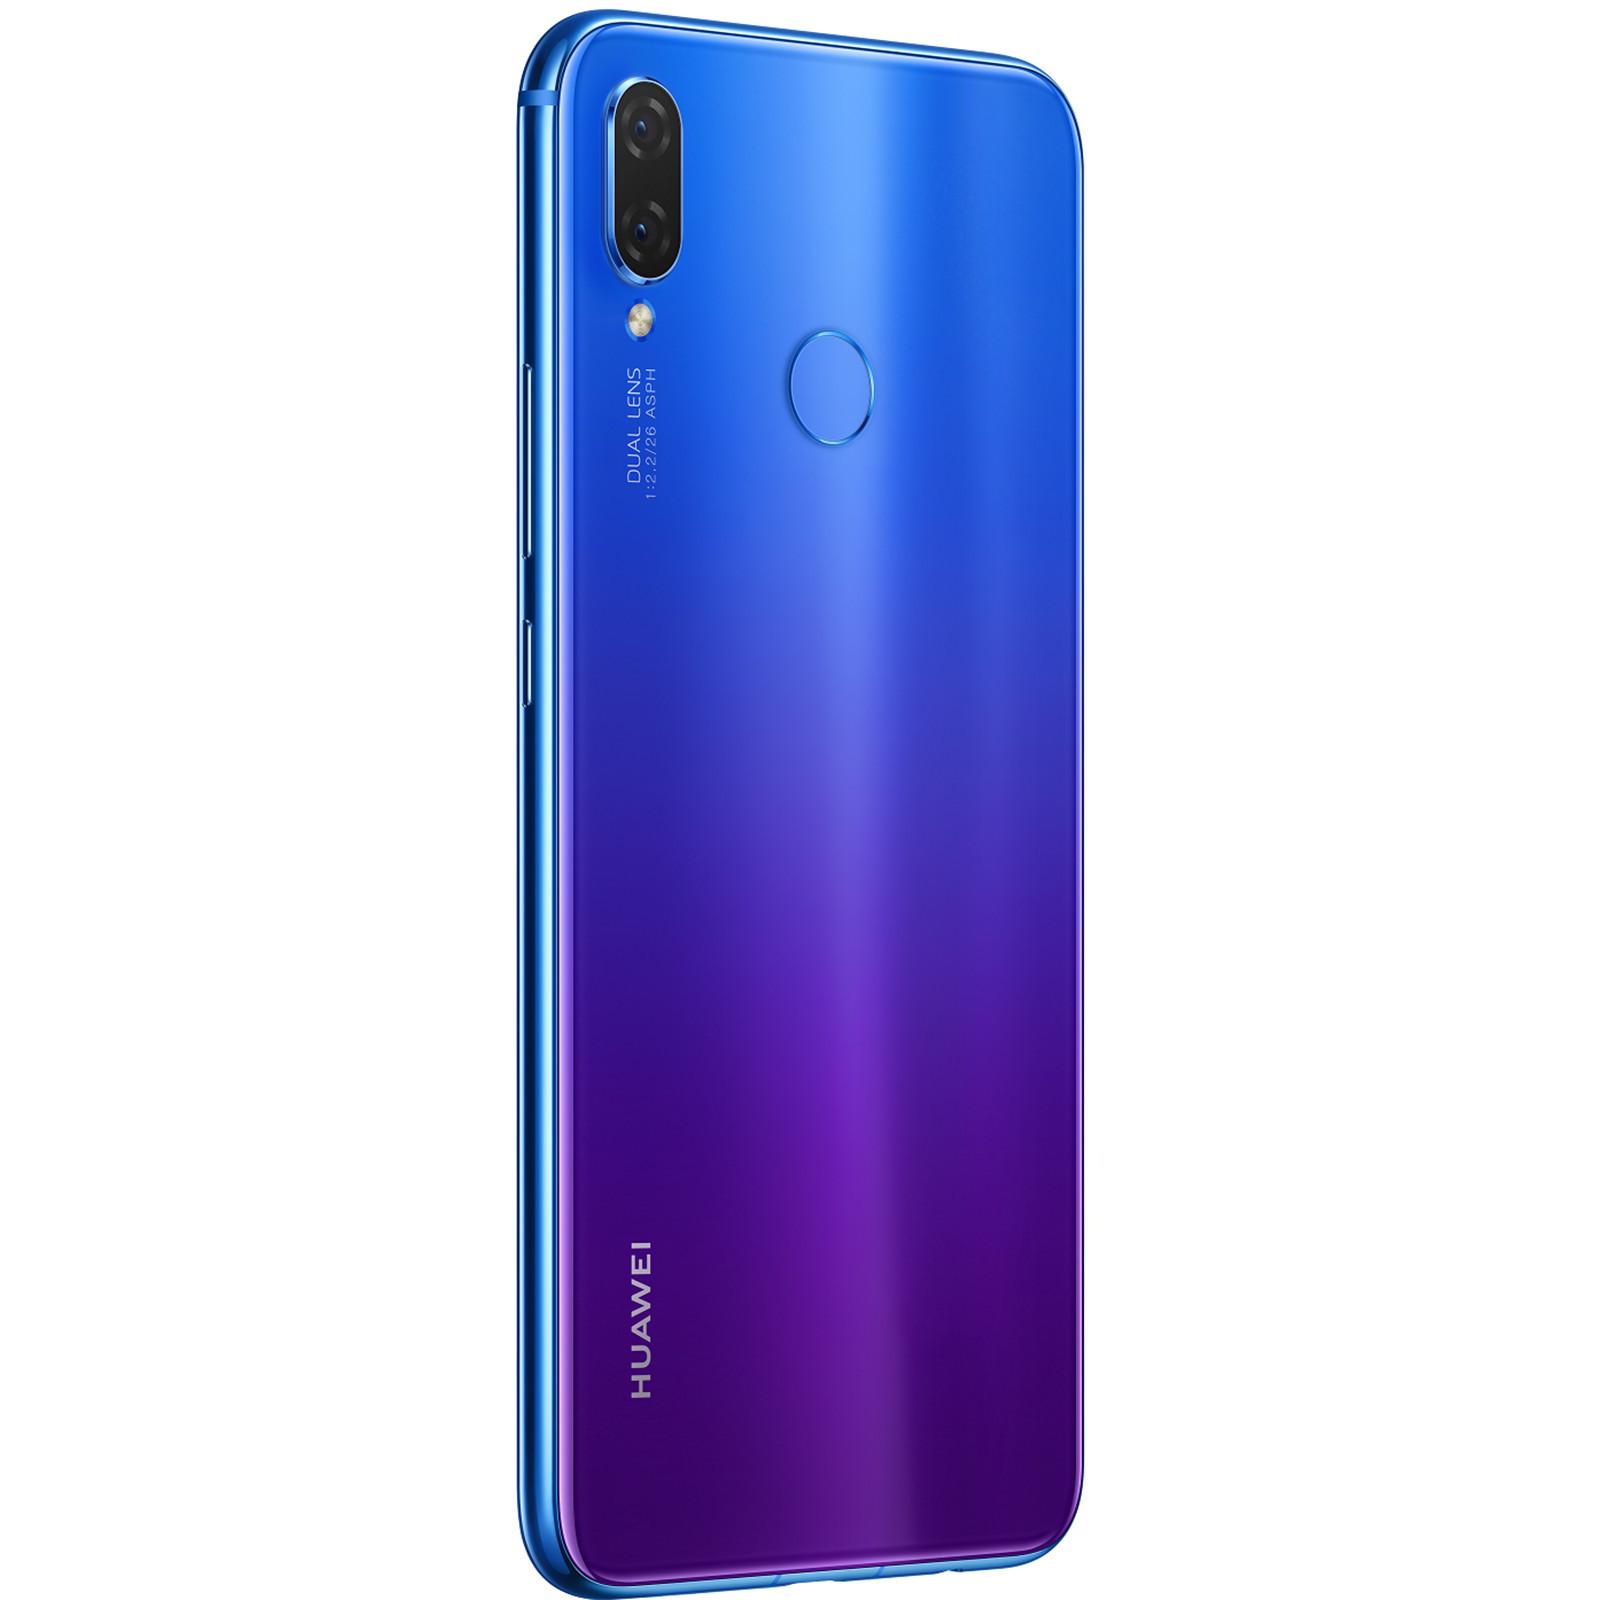 Huawei: Nova 3i Dual SIM Smartphone image